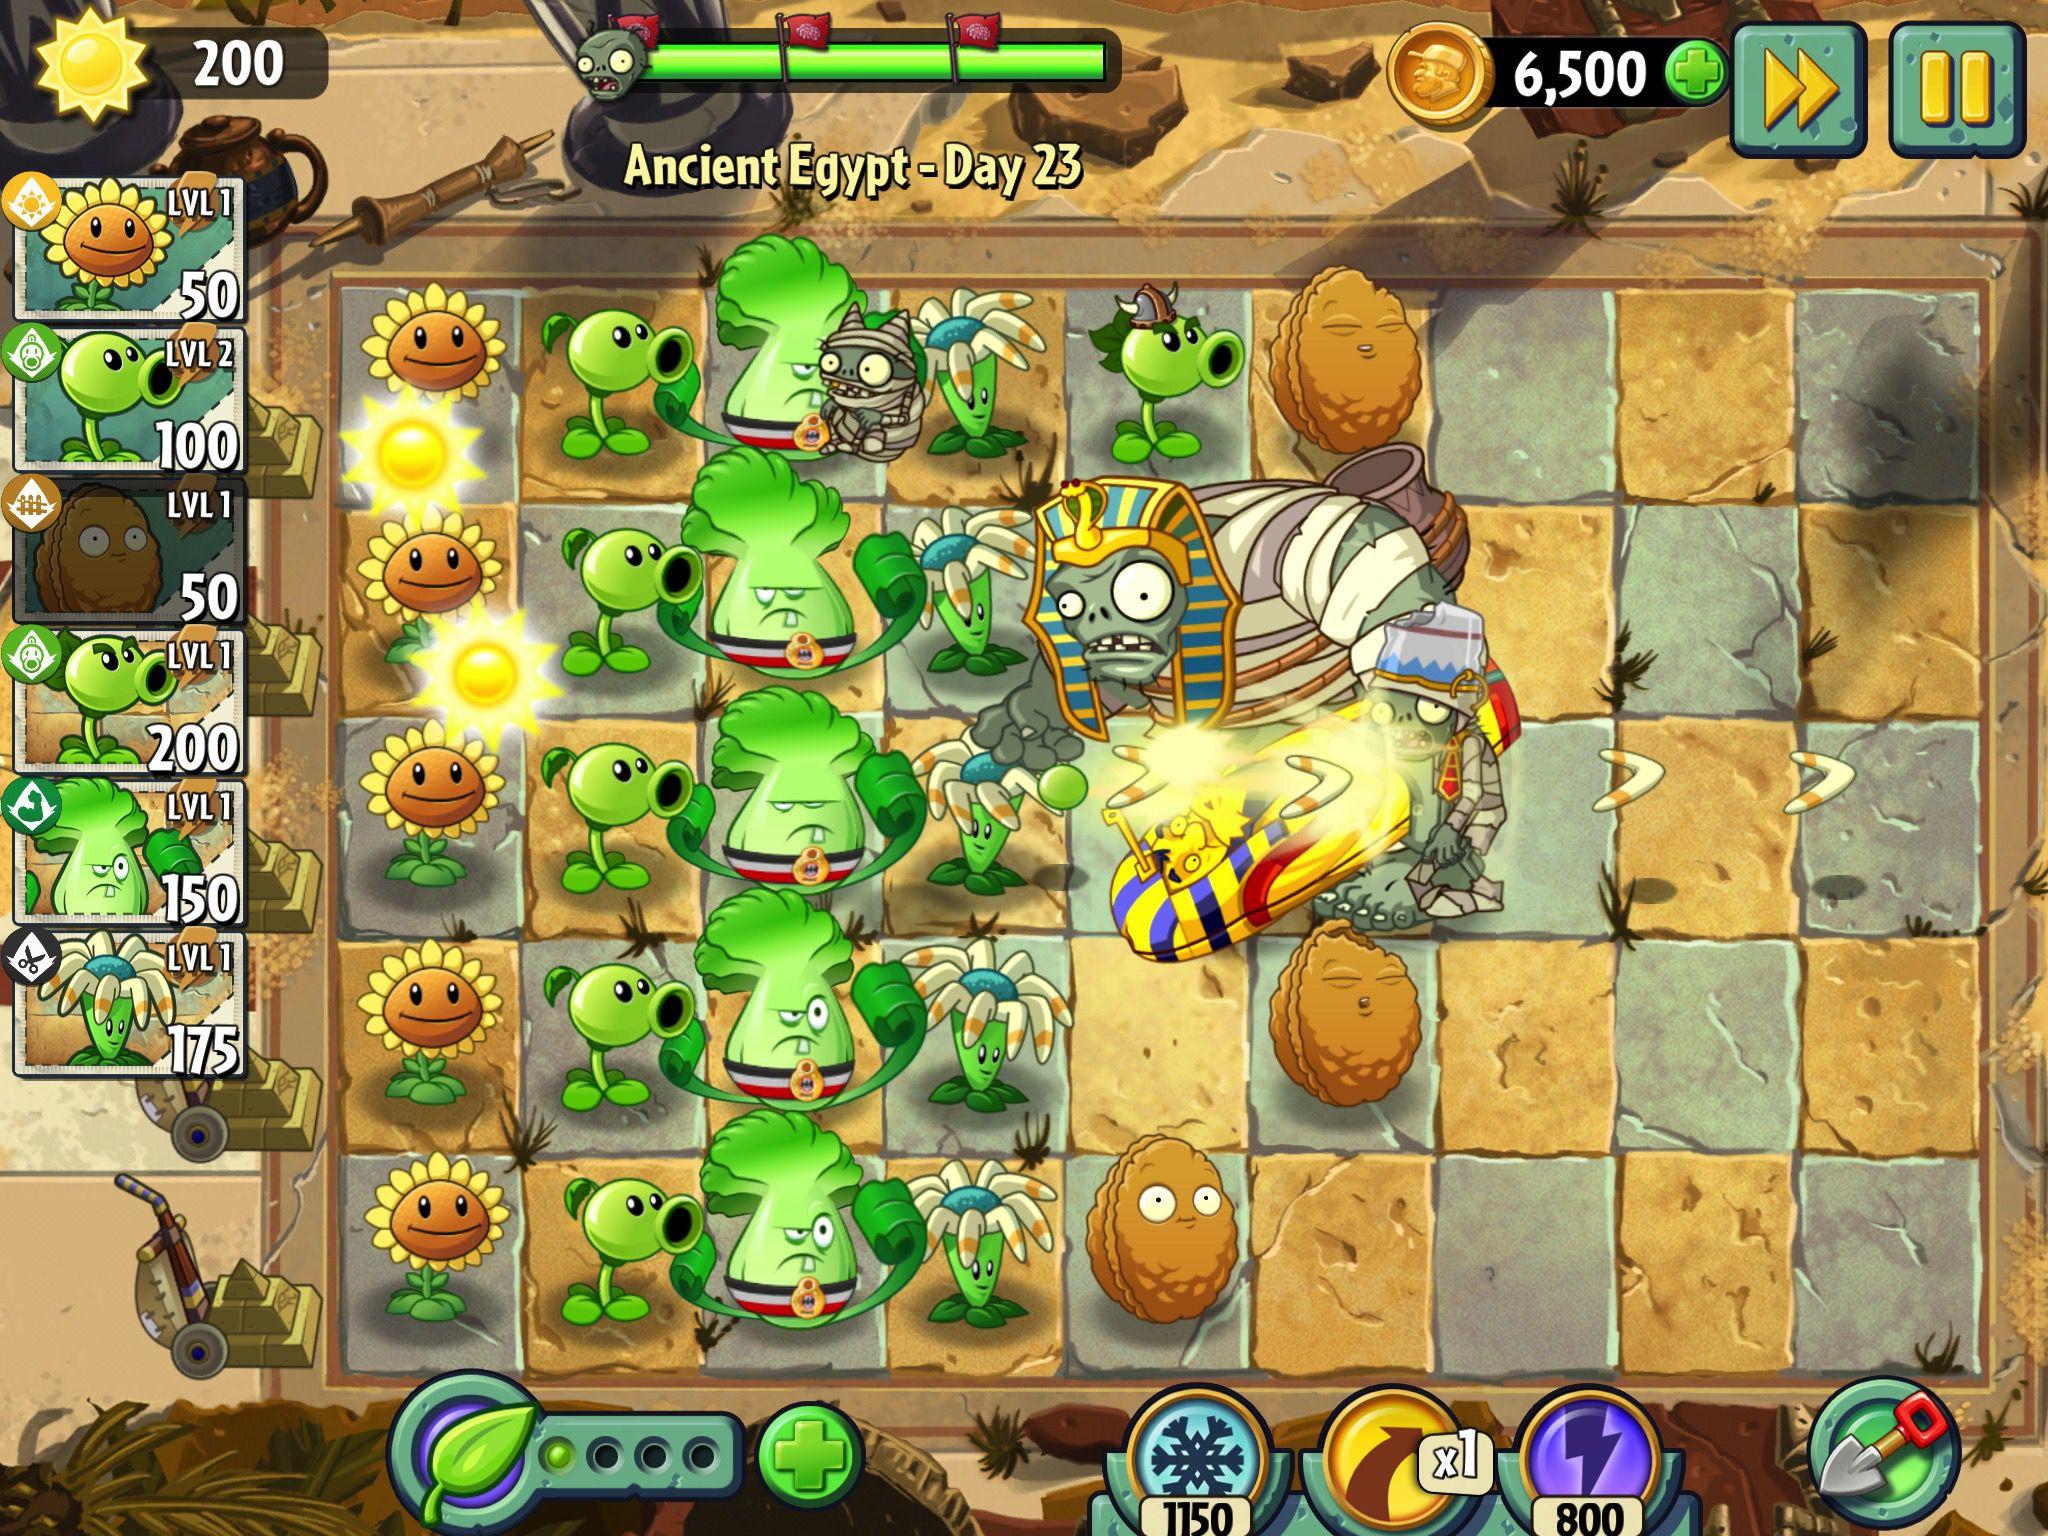 Plants vs Zombies 2 on iPad